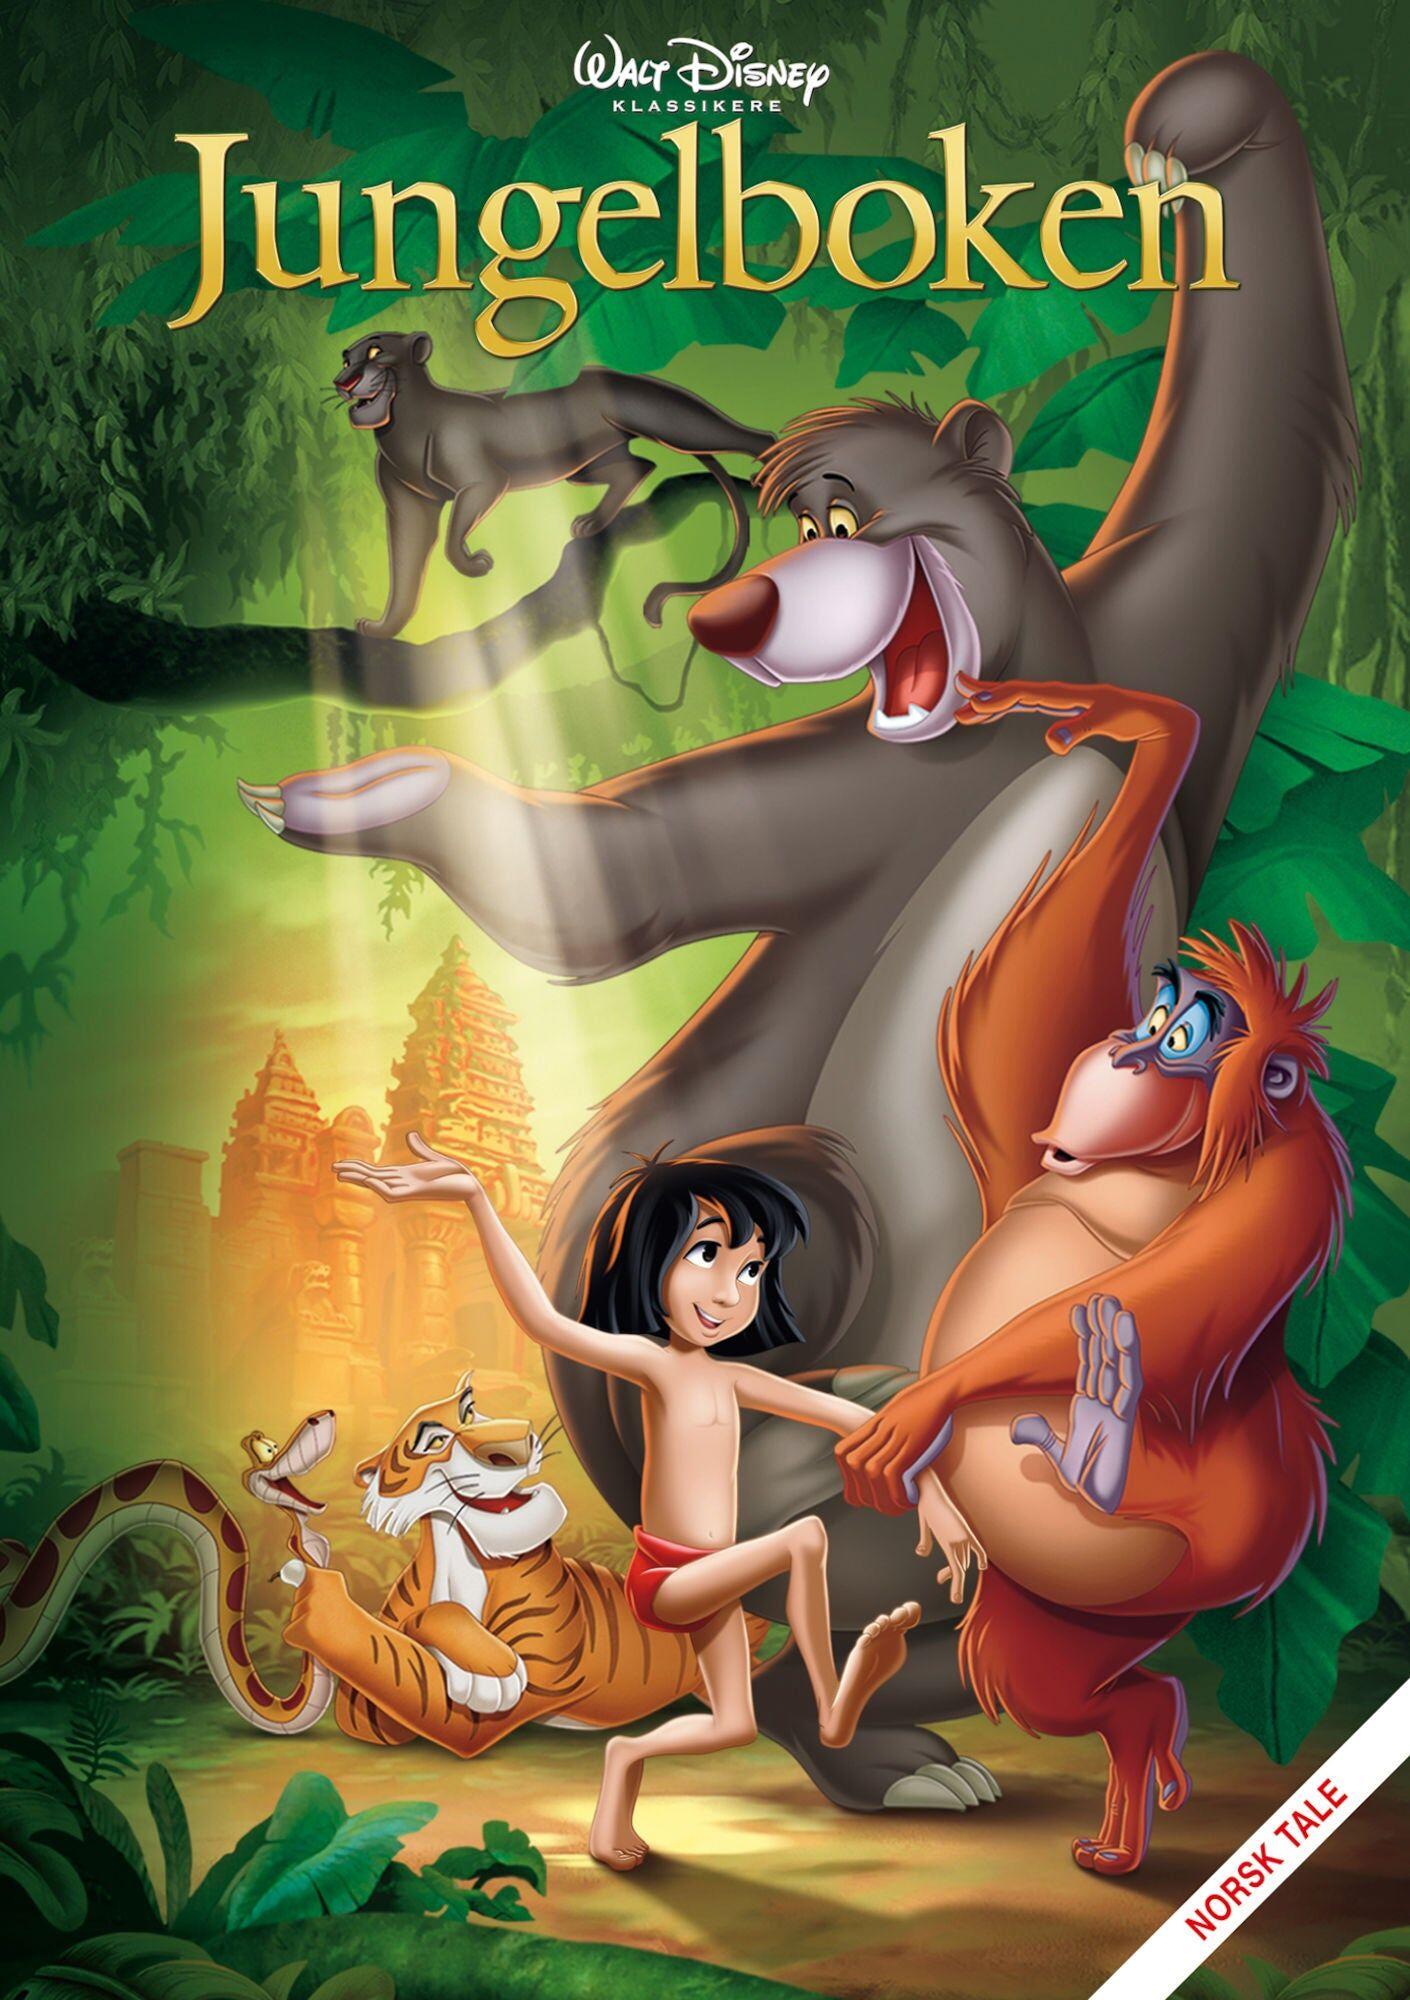 Disney Jungelboken DVD